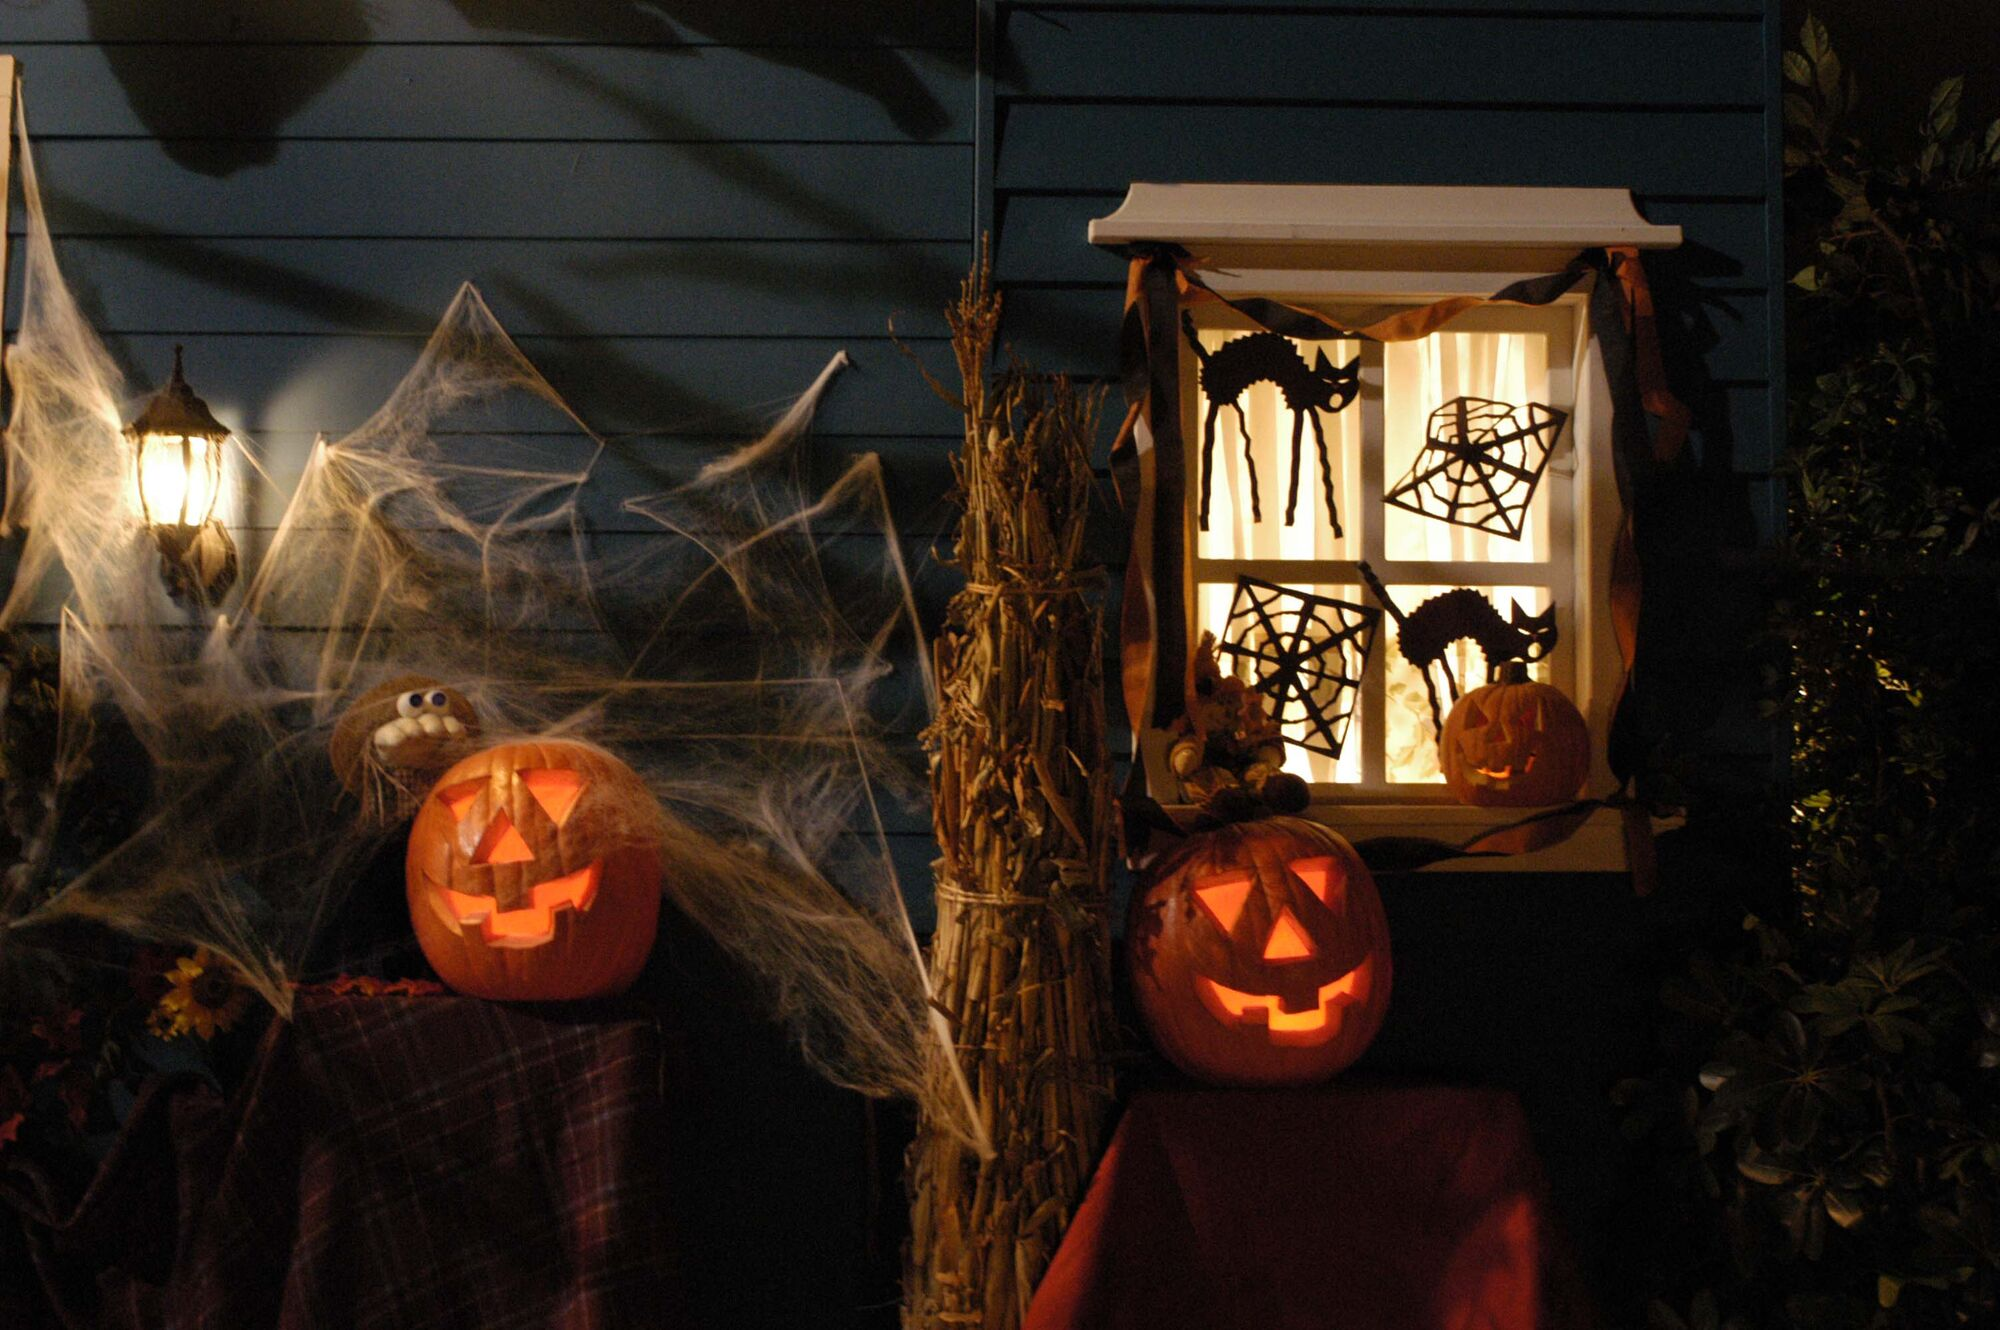 mrs johnsons house oobi wiki fandom powered by wikia - Oobi Halloween